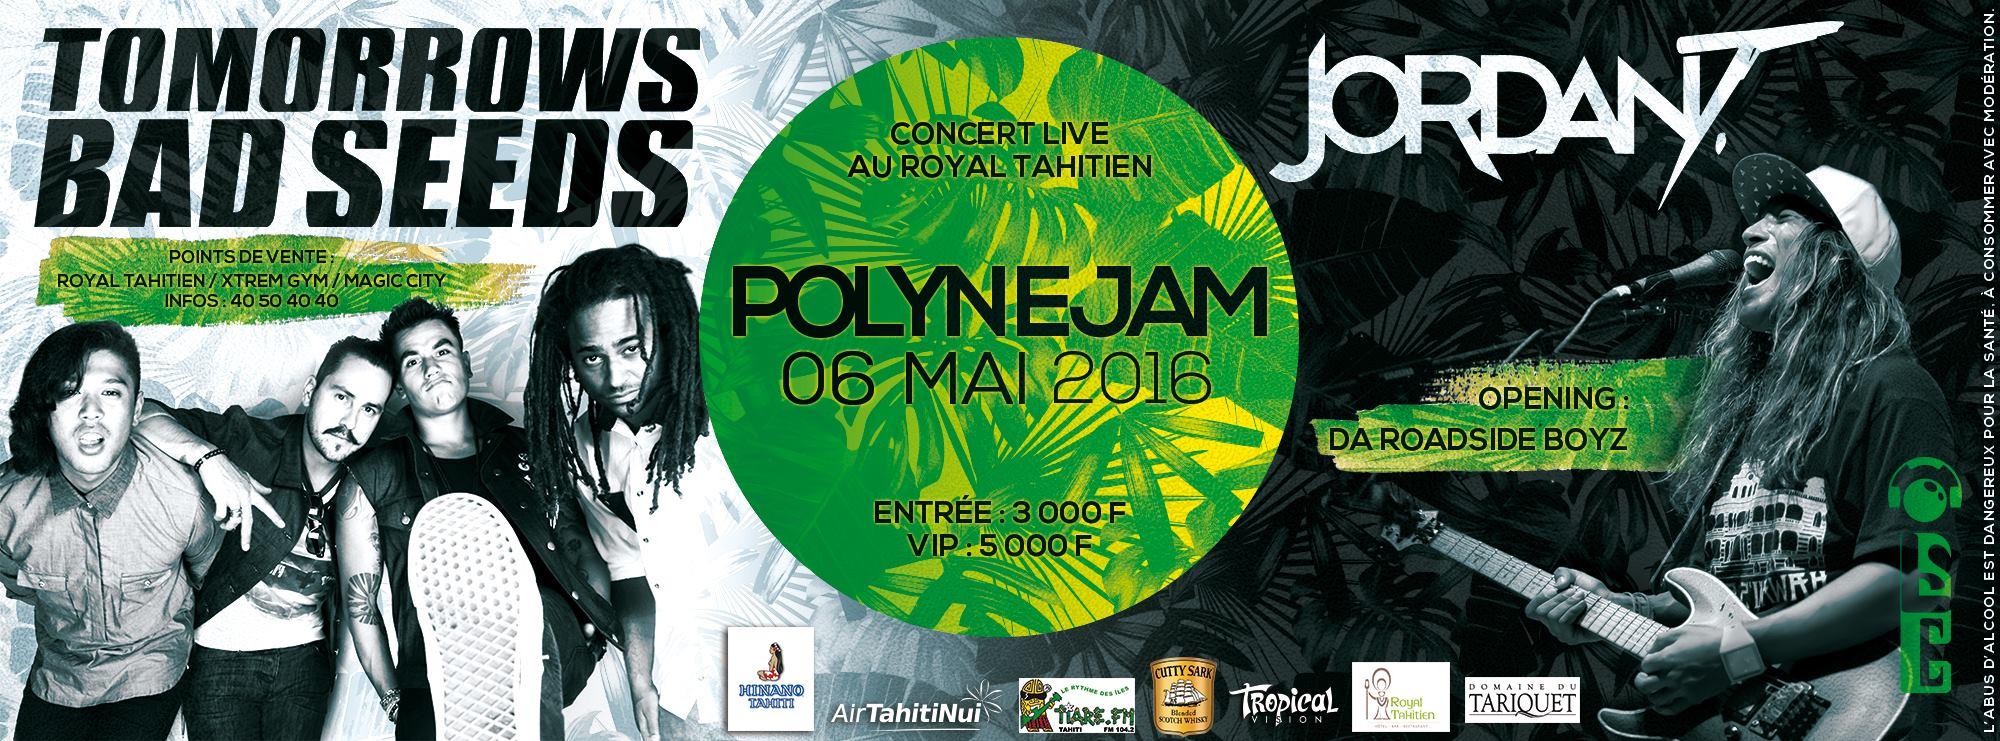 Concert Polynejam avec Tomorrows Bad Seeds et Jordan T